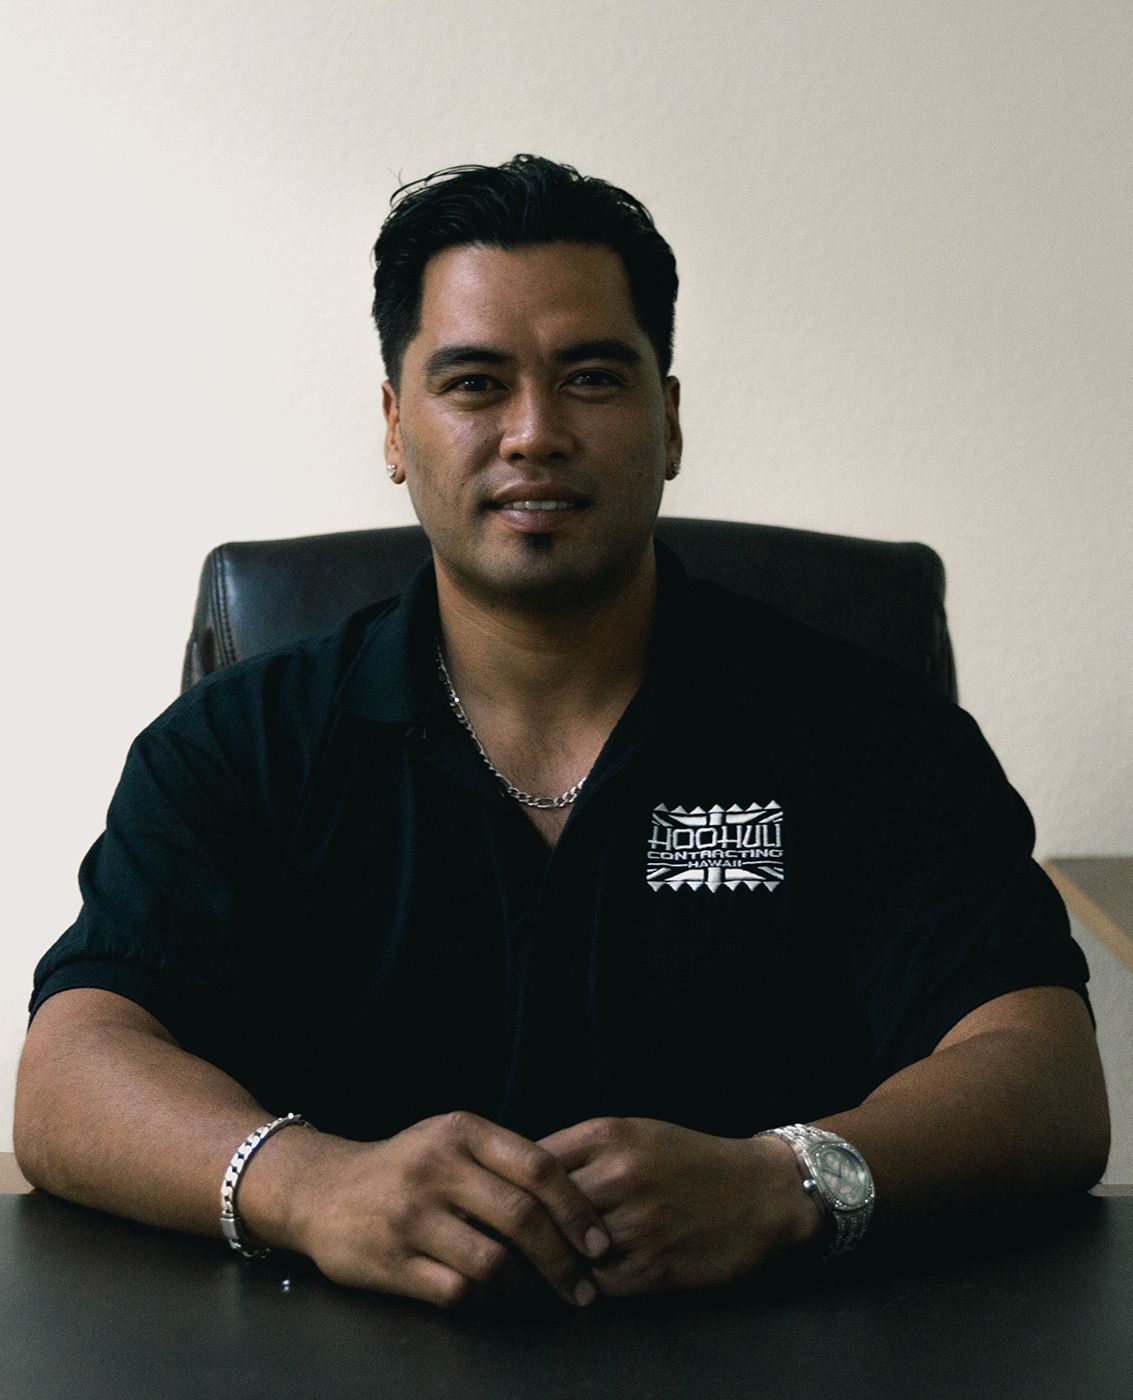 Samson Hoohuli